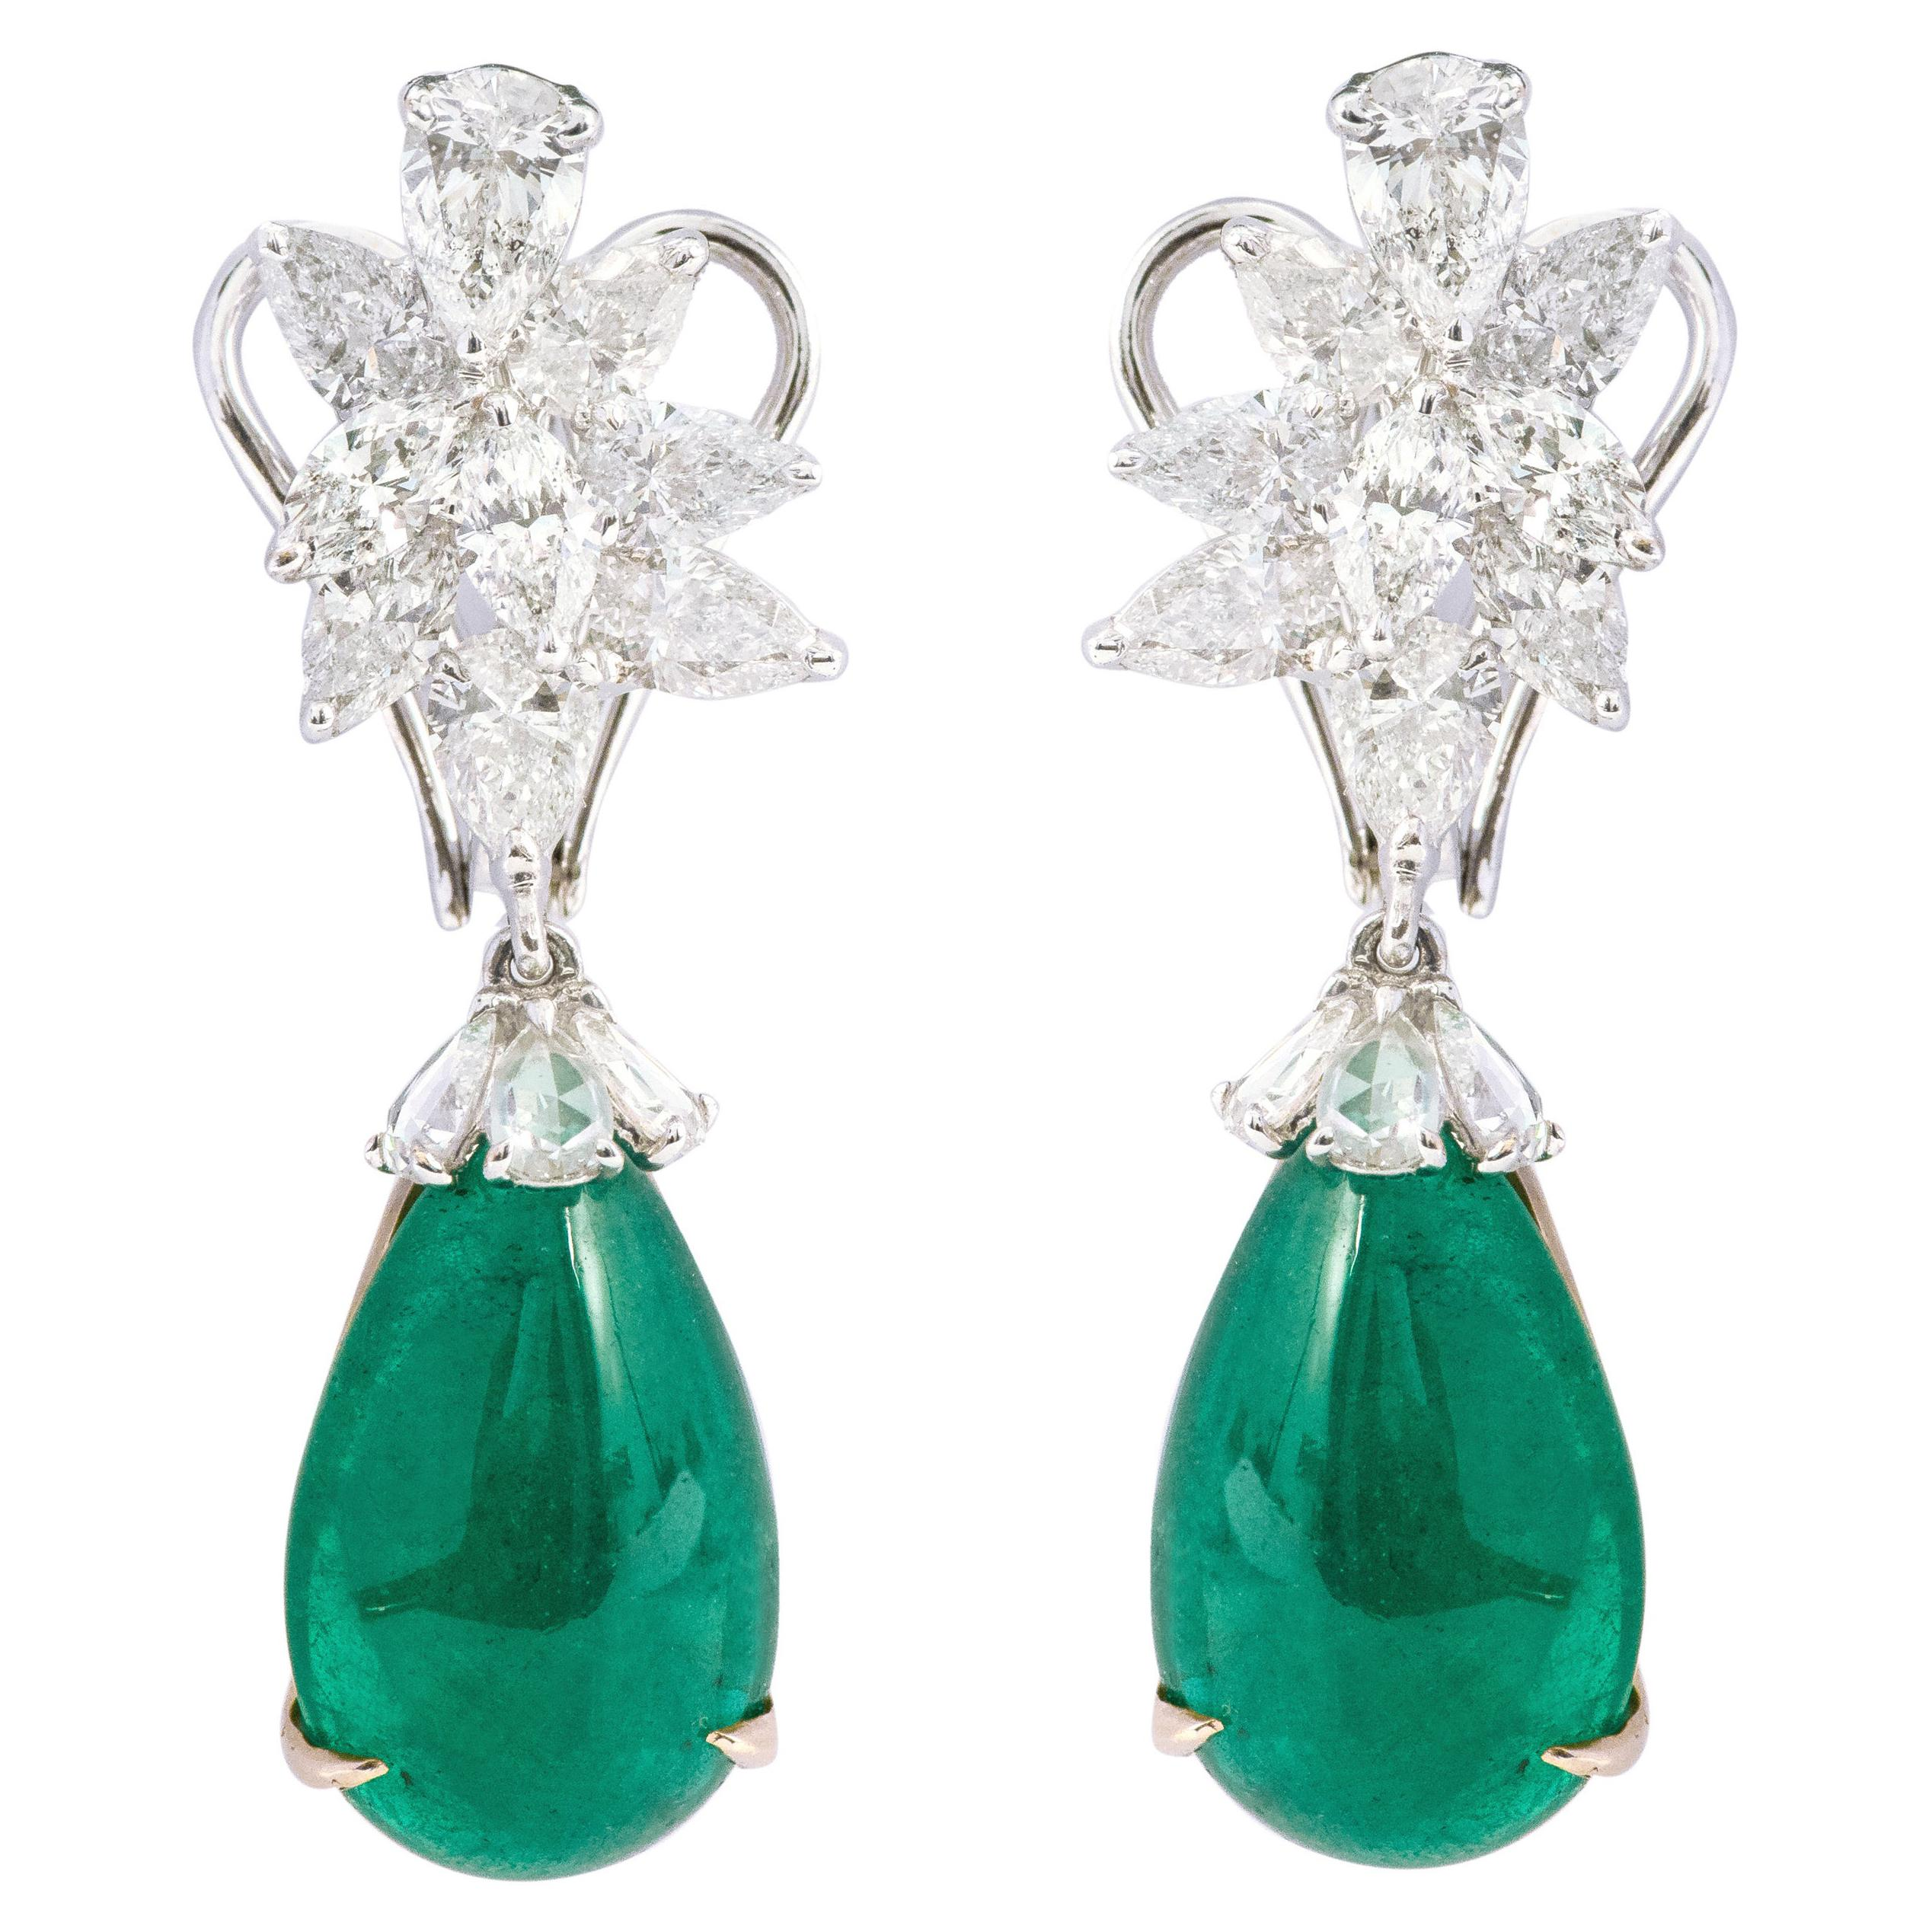 18 Karat White Gold 18.66 Carats Natural Emerald and Diamond Drop Earrings